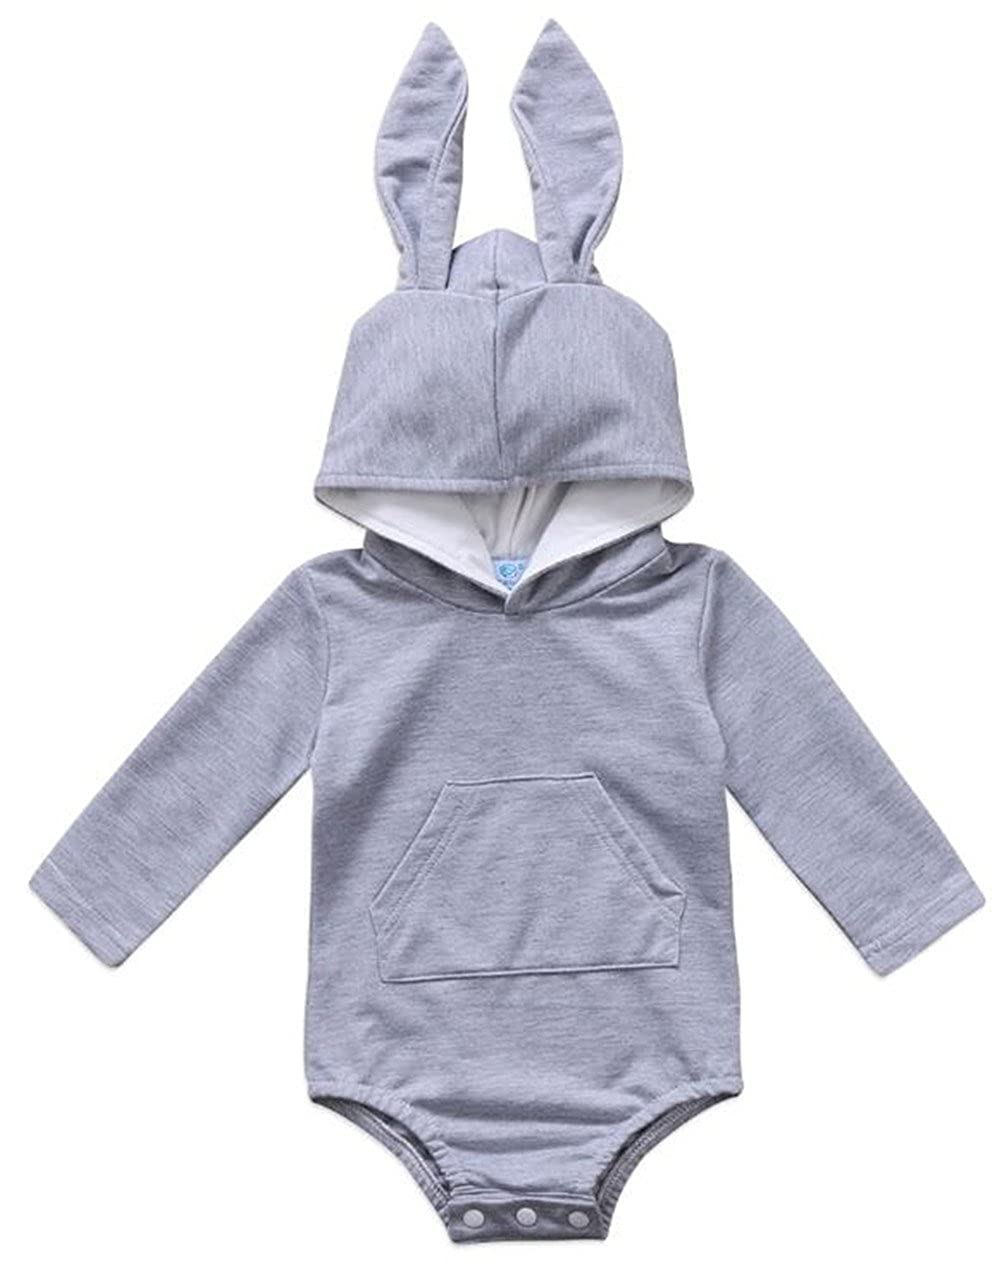 dd5fdfe06d75 Amazon.com  UNIQUEONE Newborn Kids Baby Boy Girl Bunny Romper Warm ...